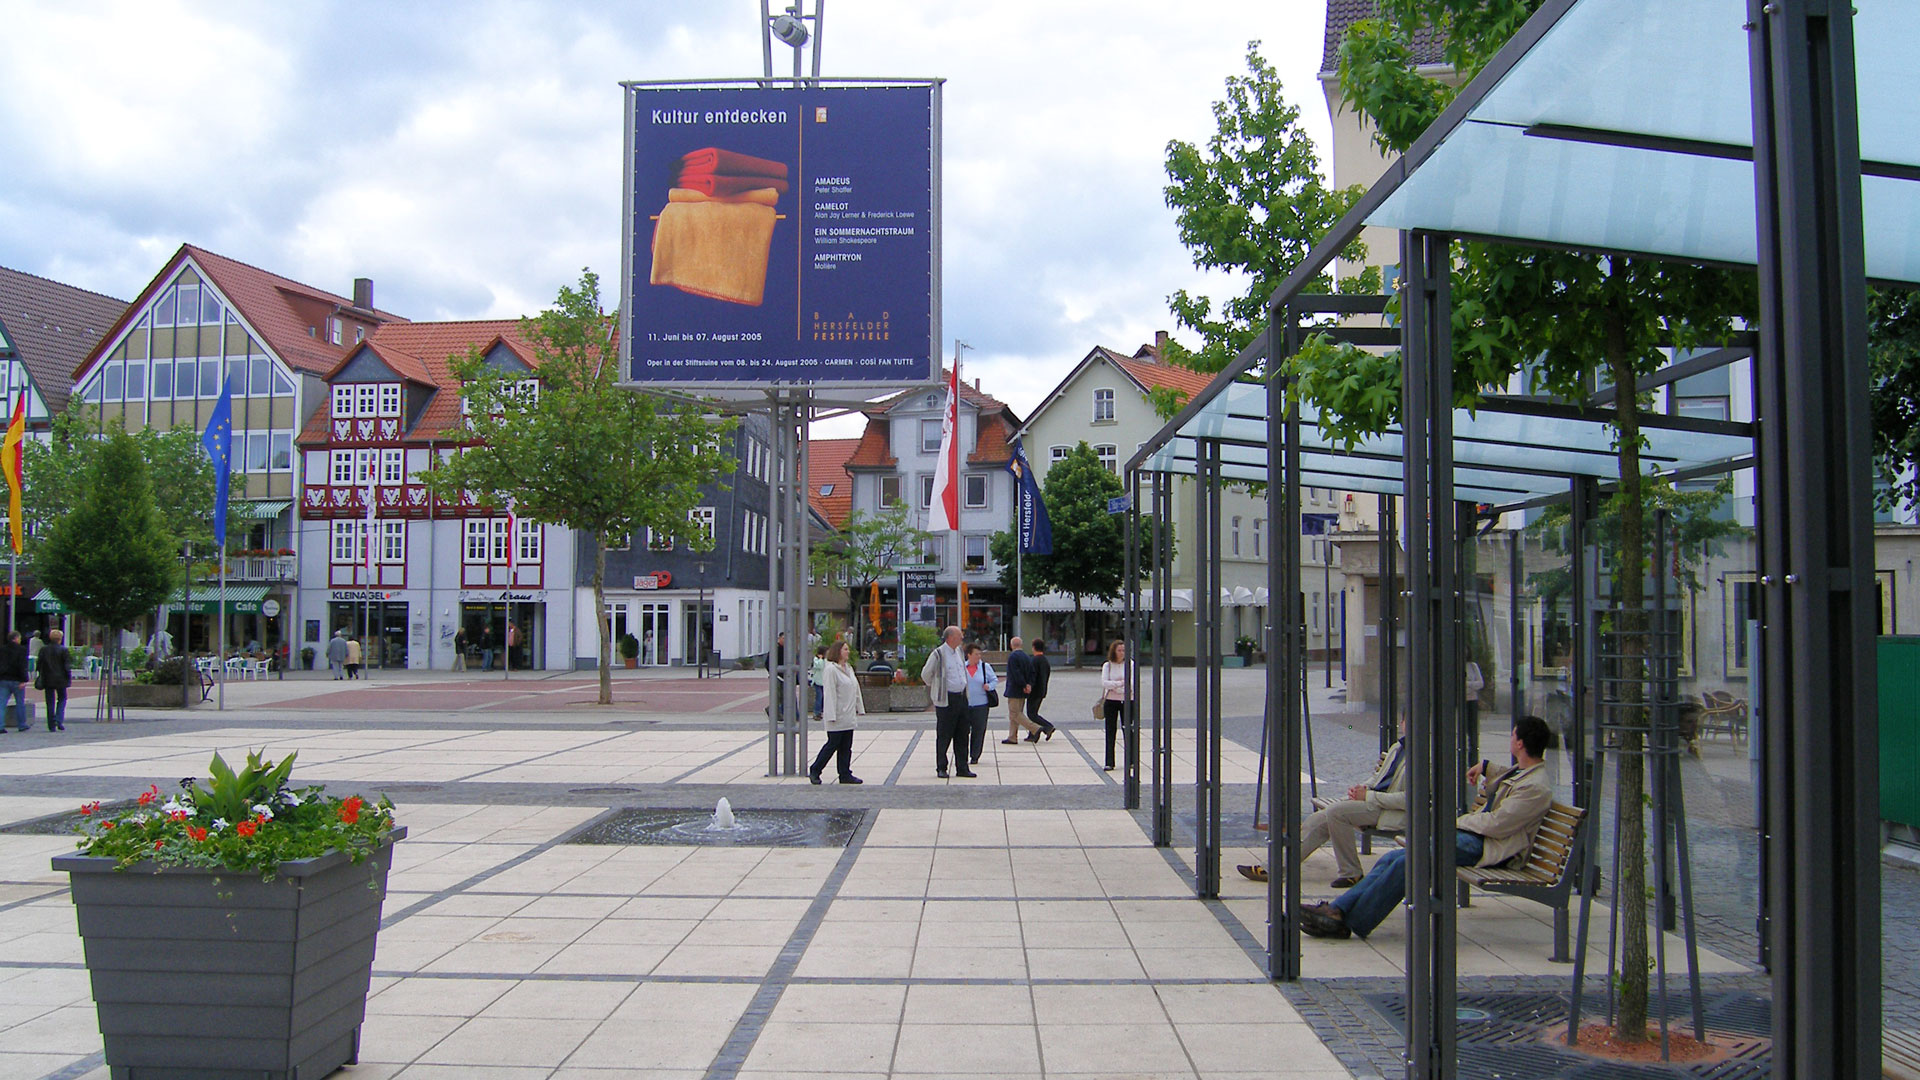 Bad_Hersfeld_Lingplatz_02